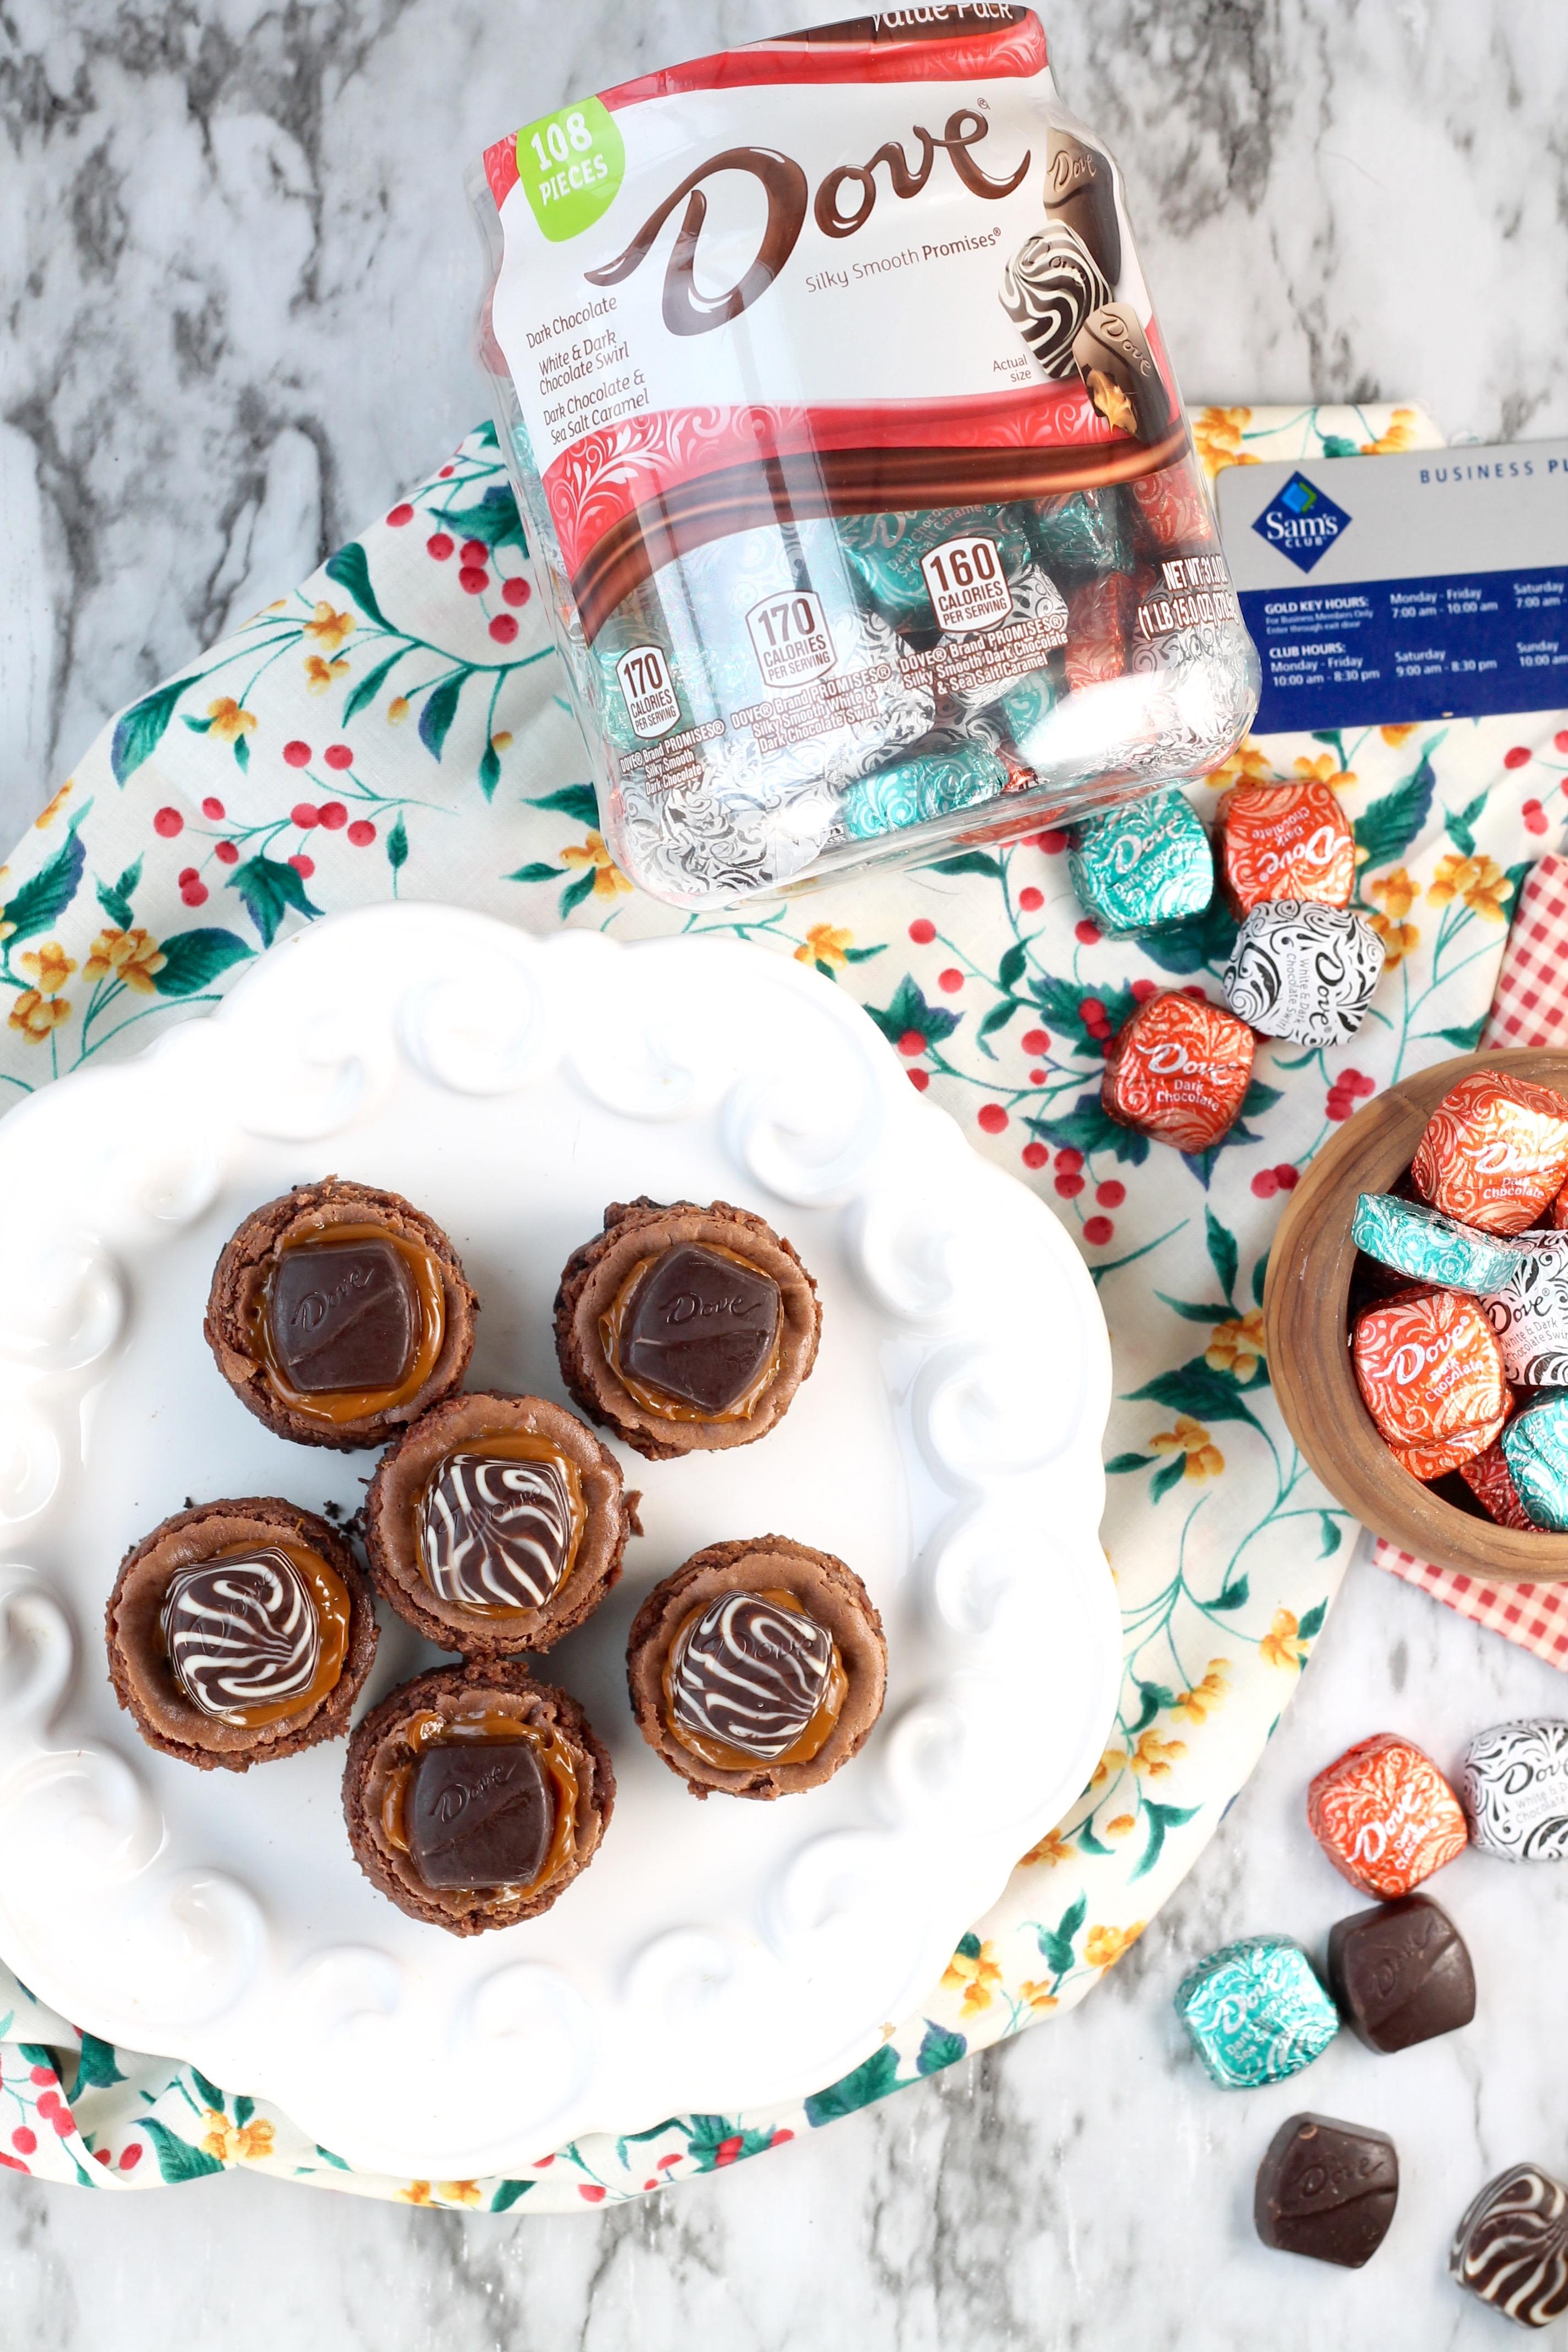 Dove Mini Cheesecakes with Dove Chocolates & Sam's Club